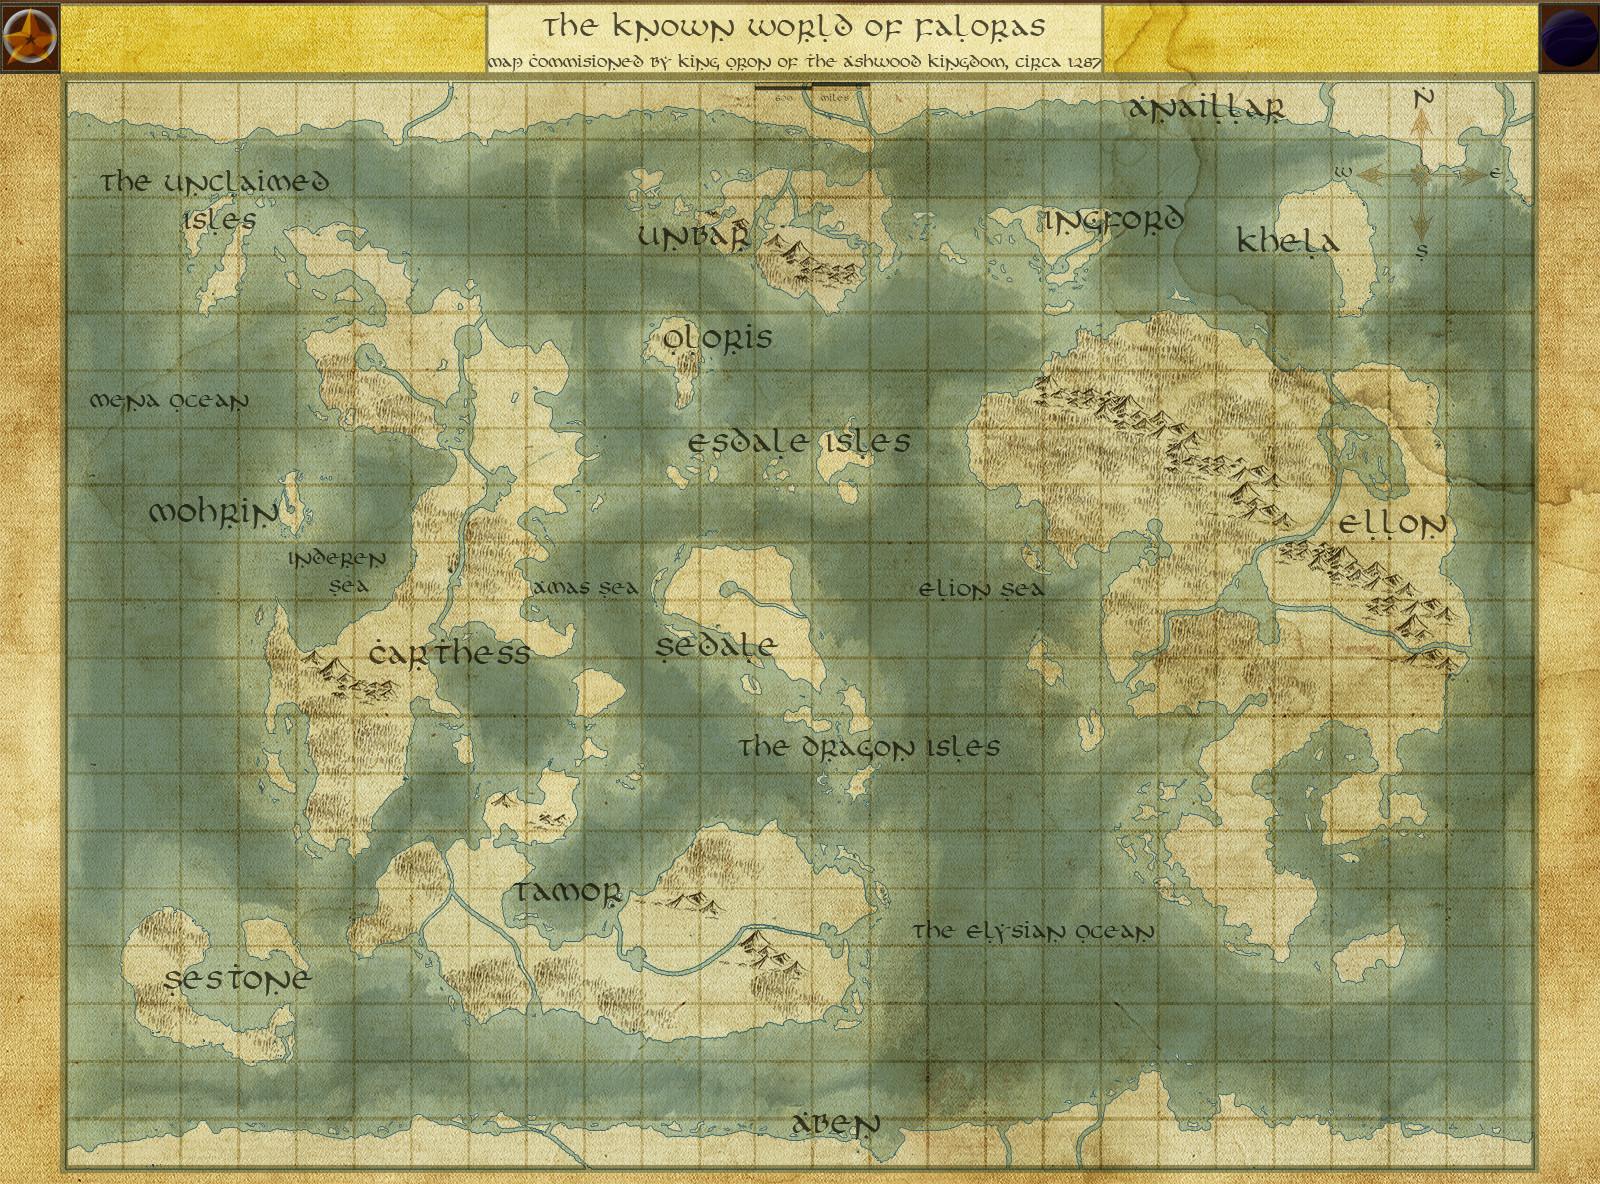 Final map of Faloras